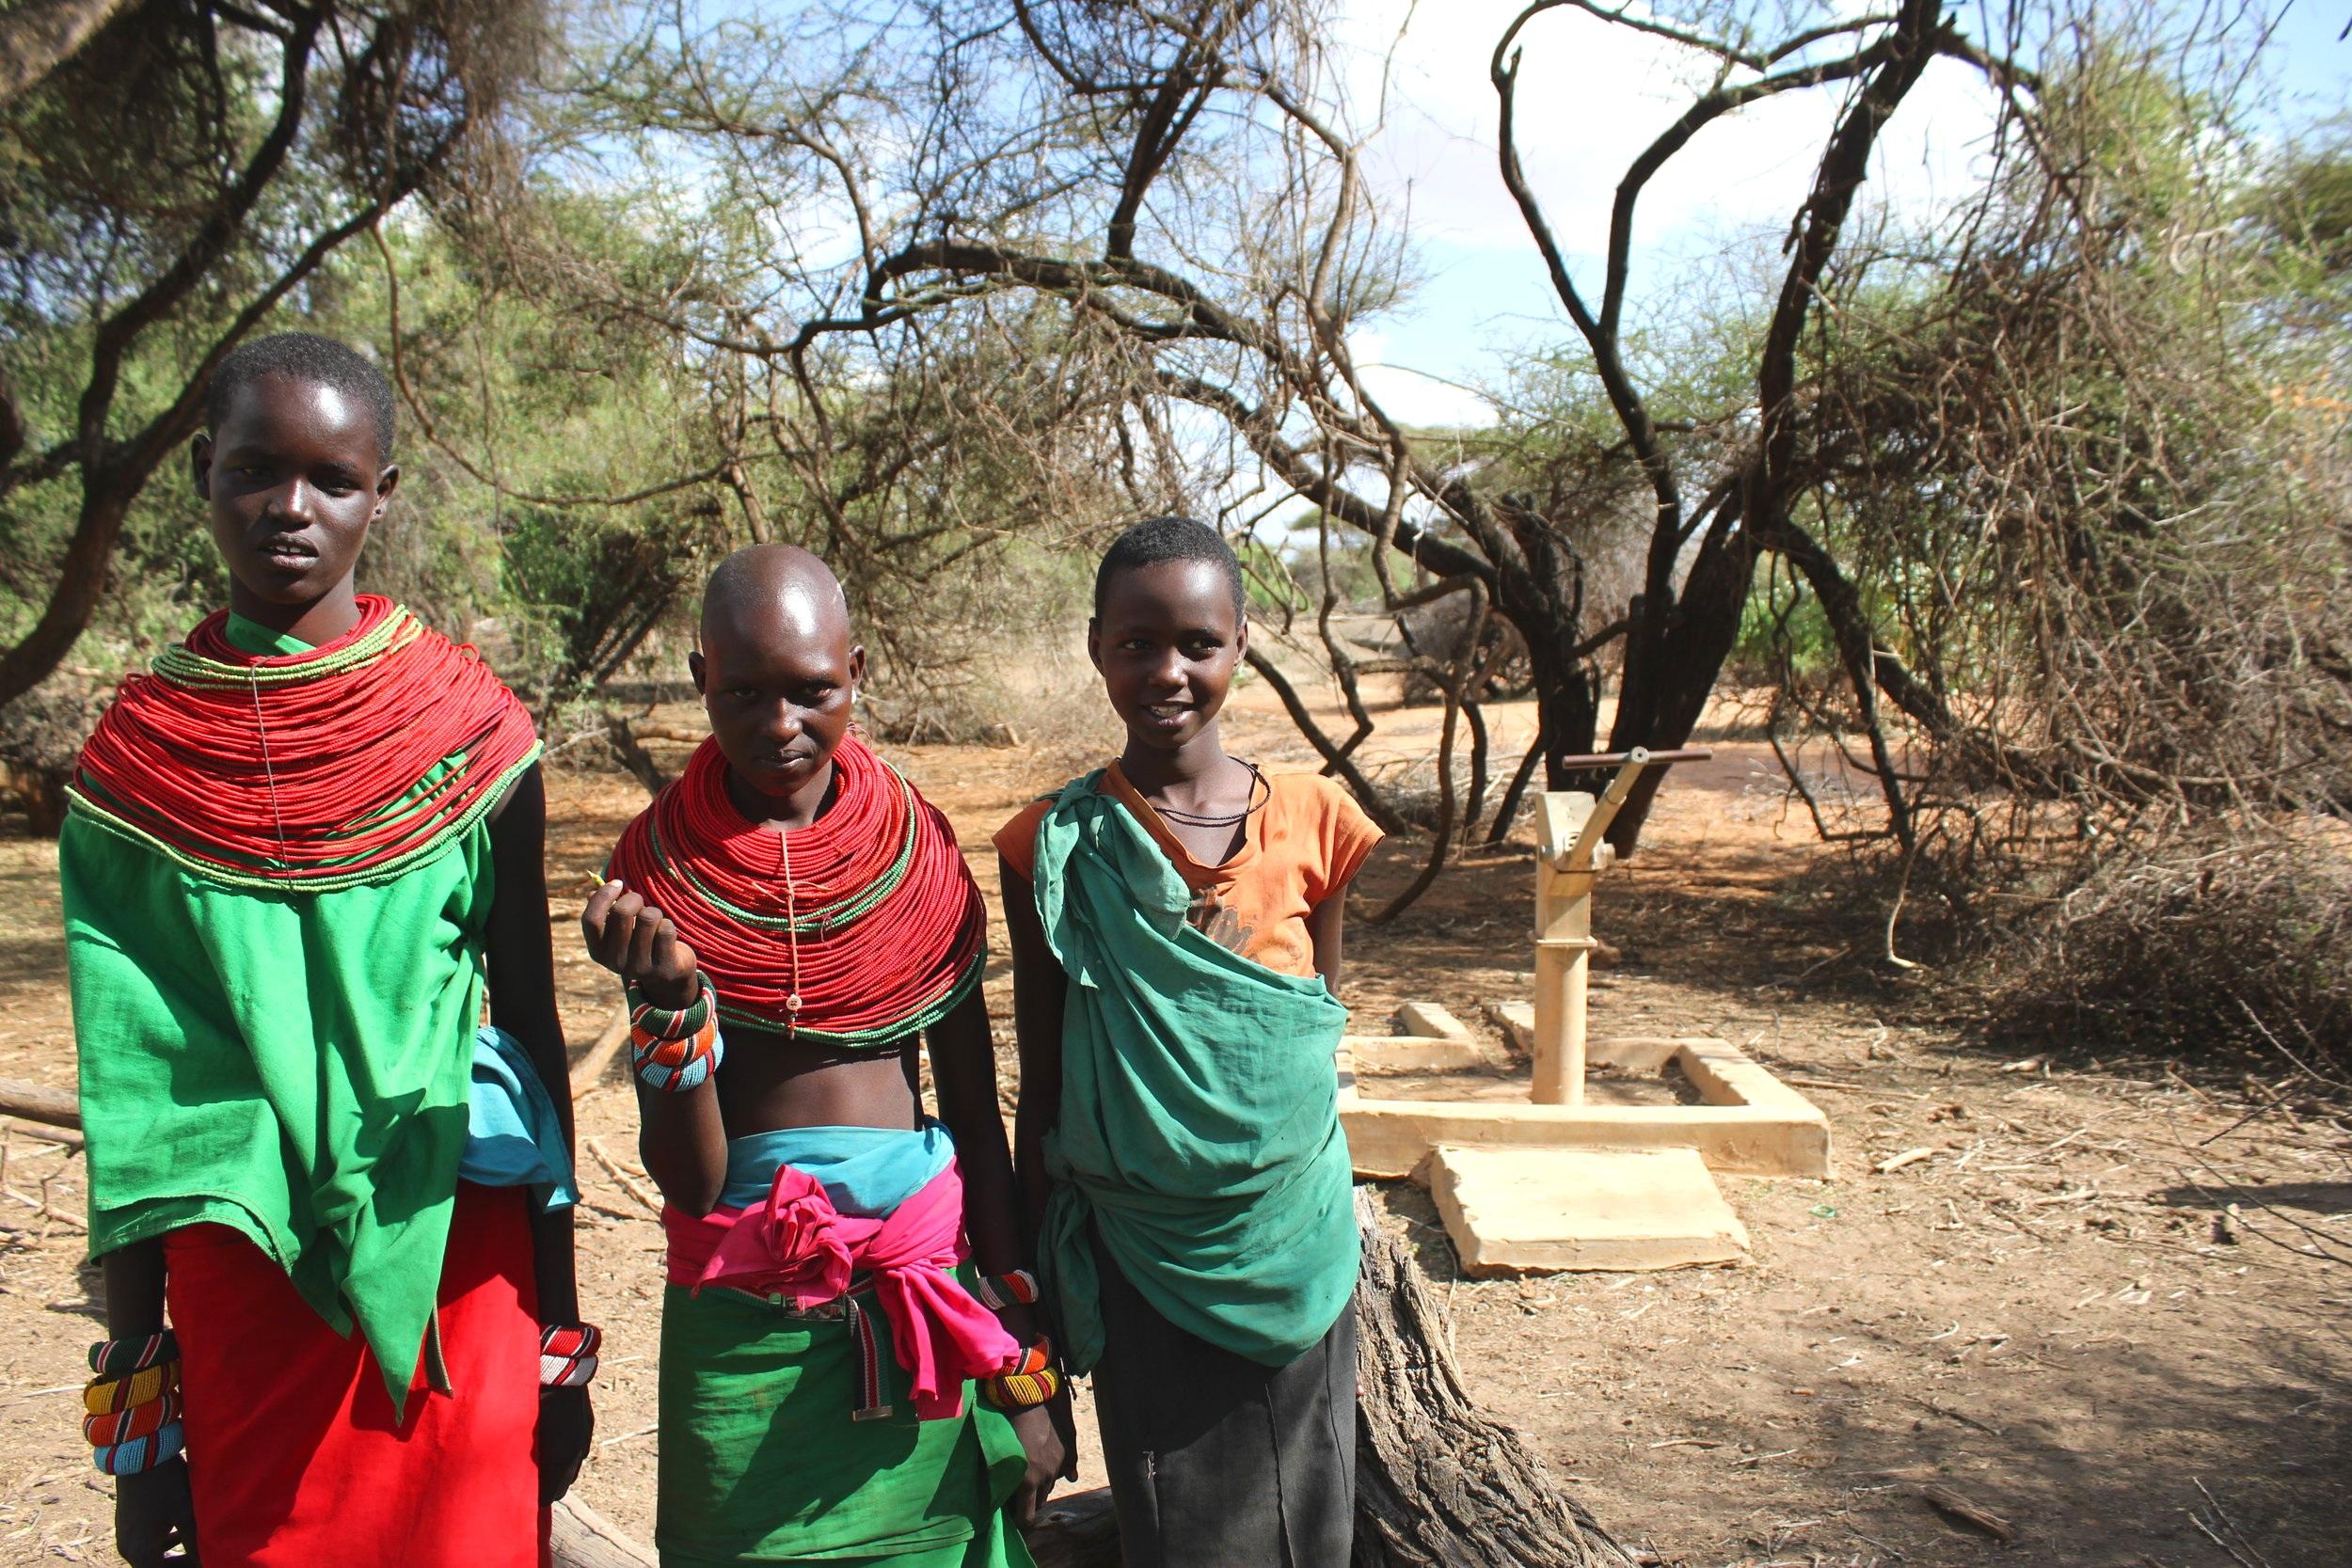 Young Girls Smiling by Well, Samburu Kenya Africa